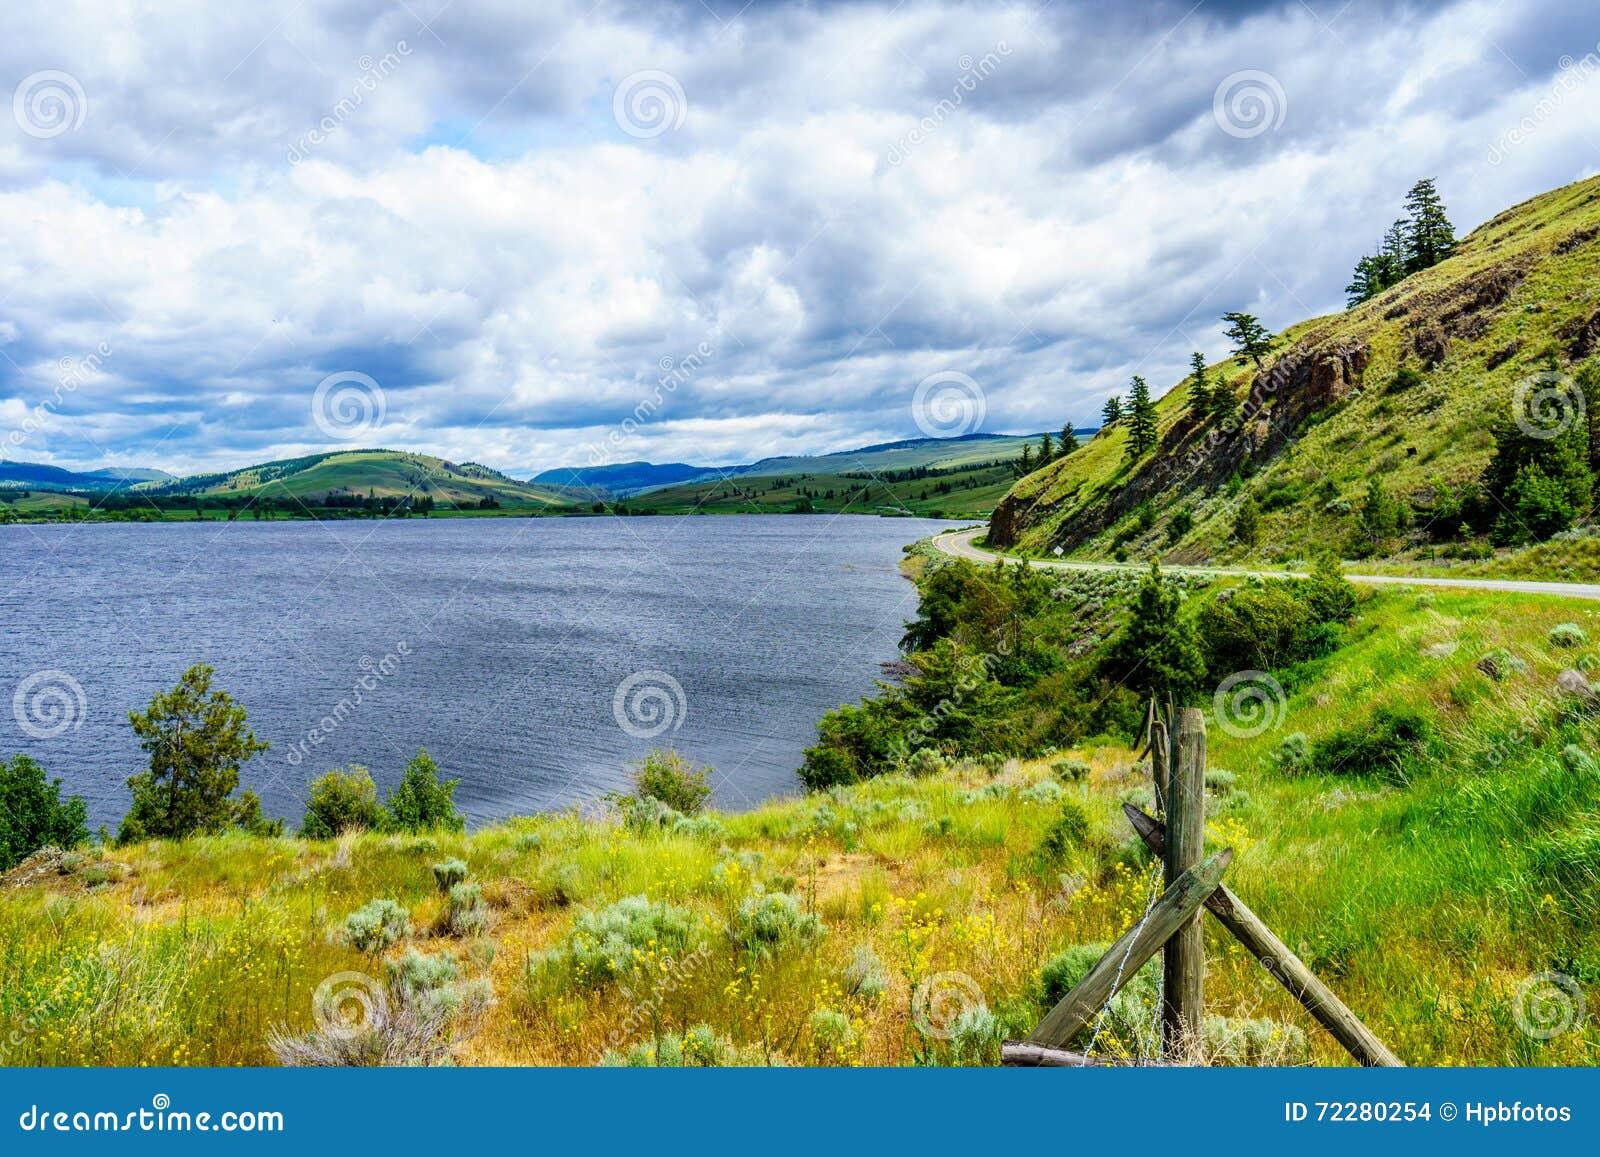 Nicola湖和Nicola谷在多云天空下